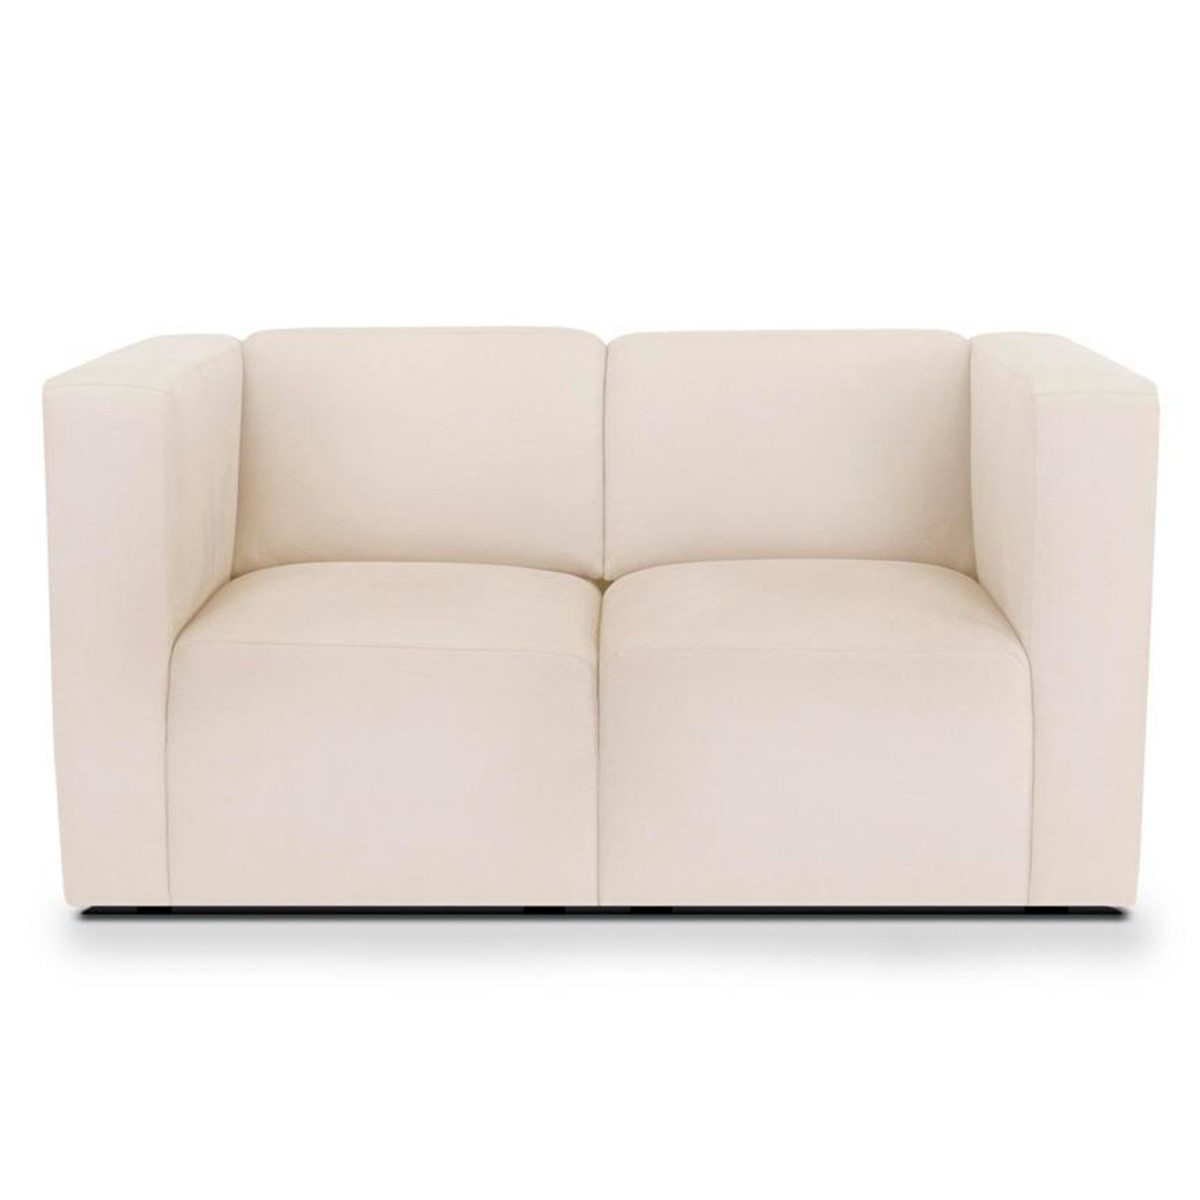 Monte Design Bruce 2-Seat Sofa | Bograd Kids Modern Furniture NYC